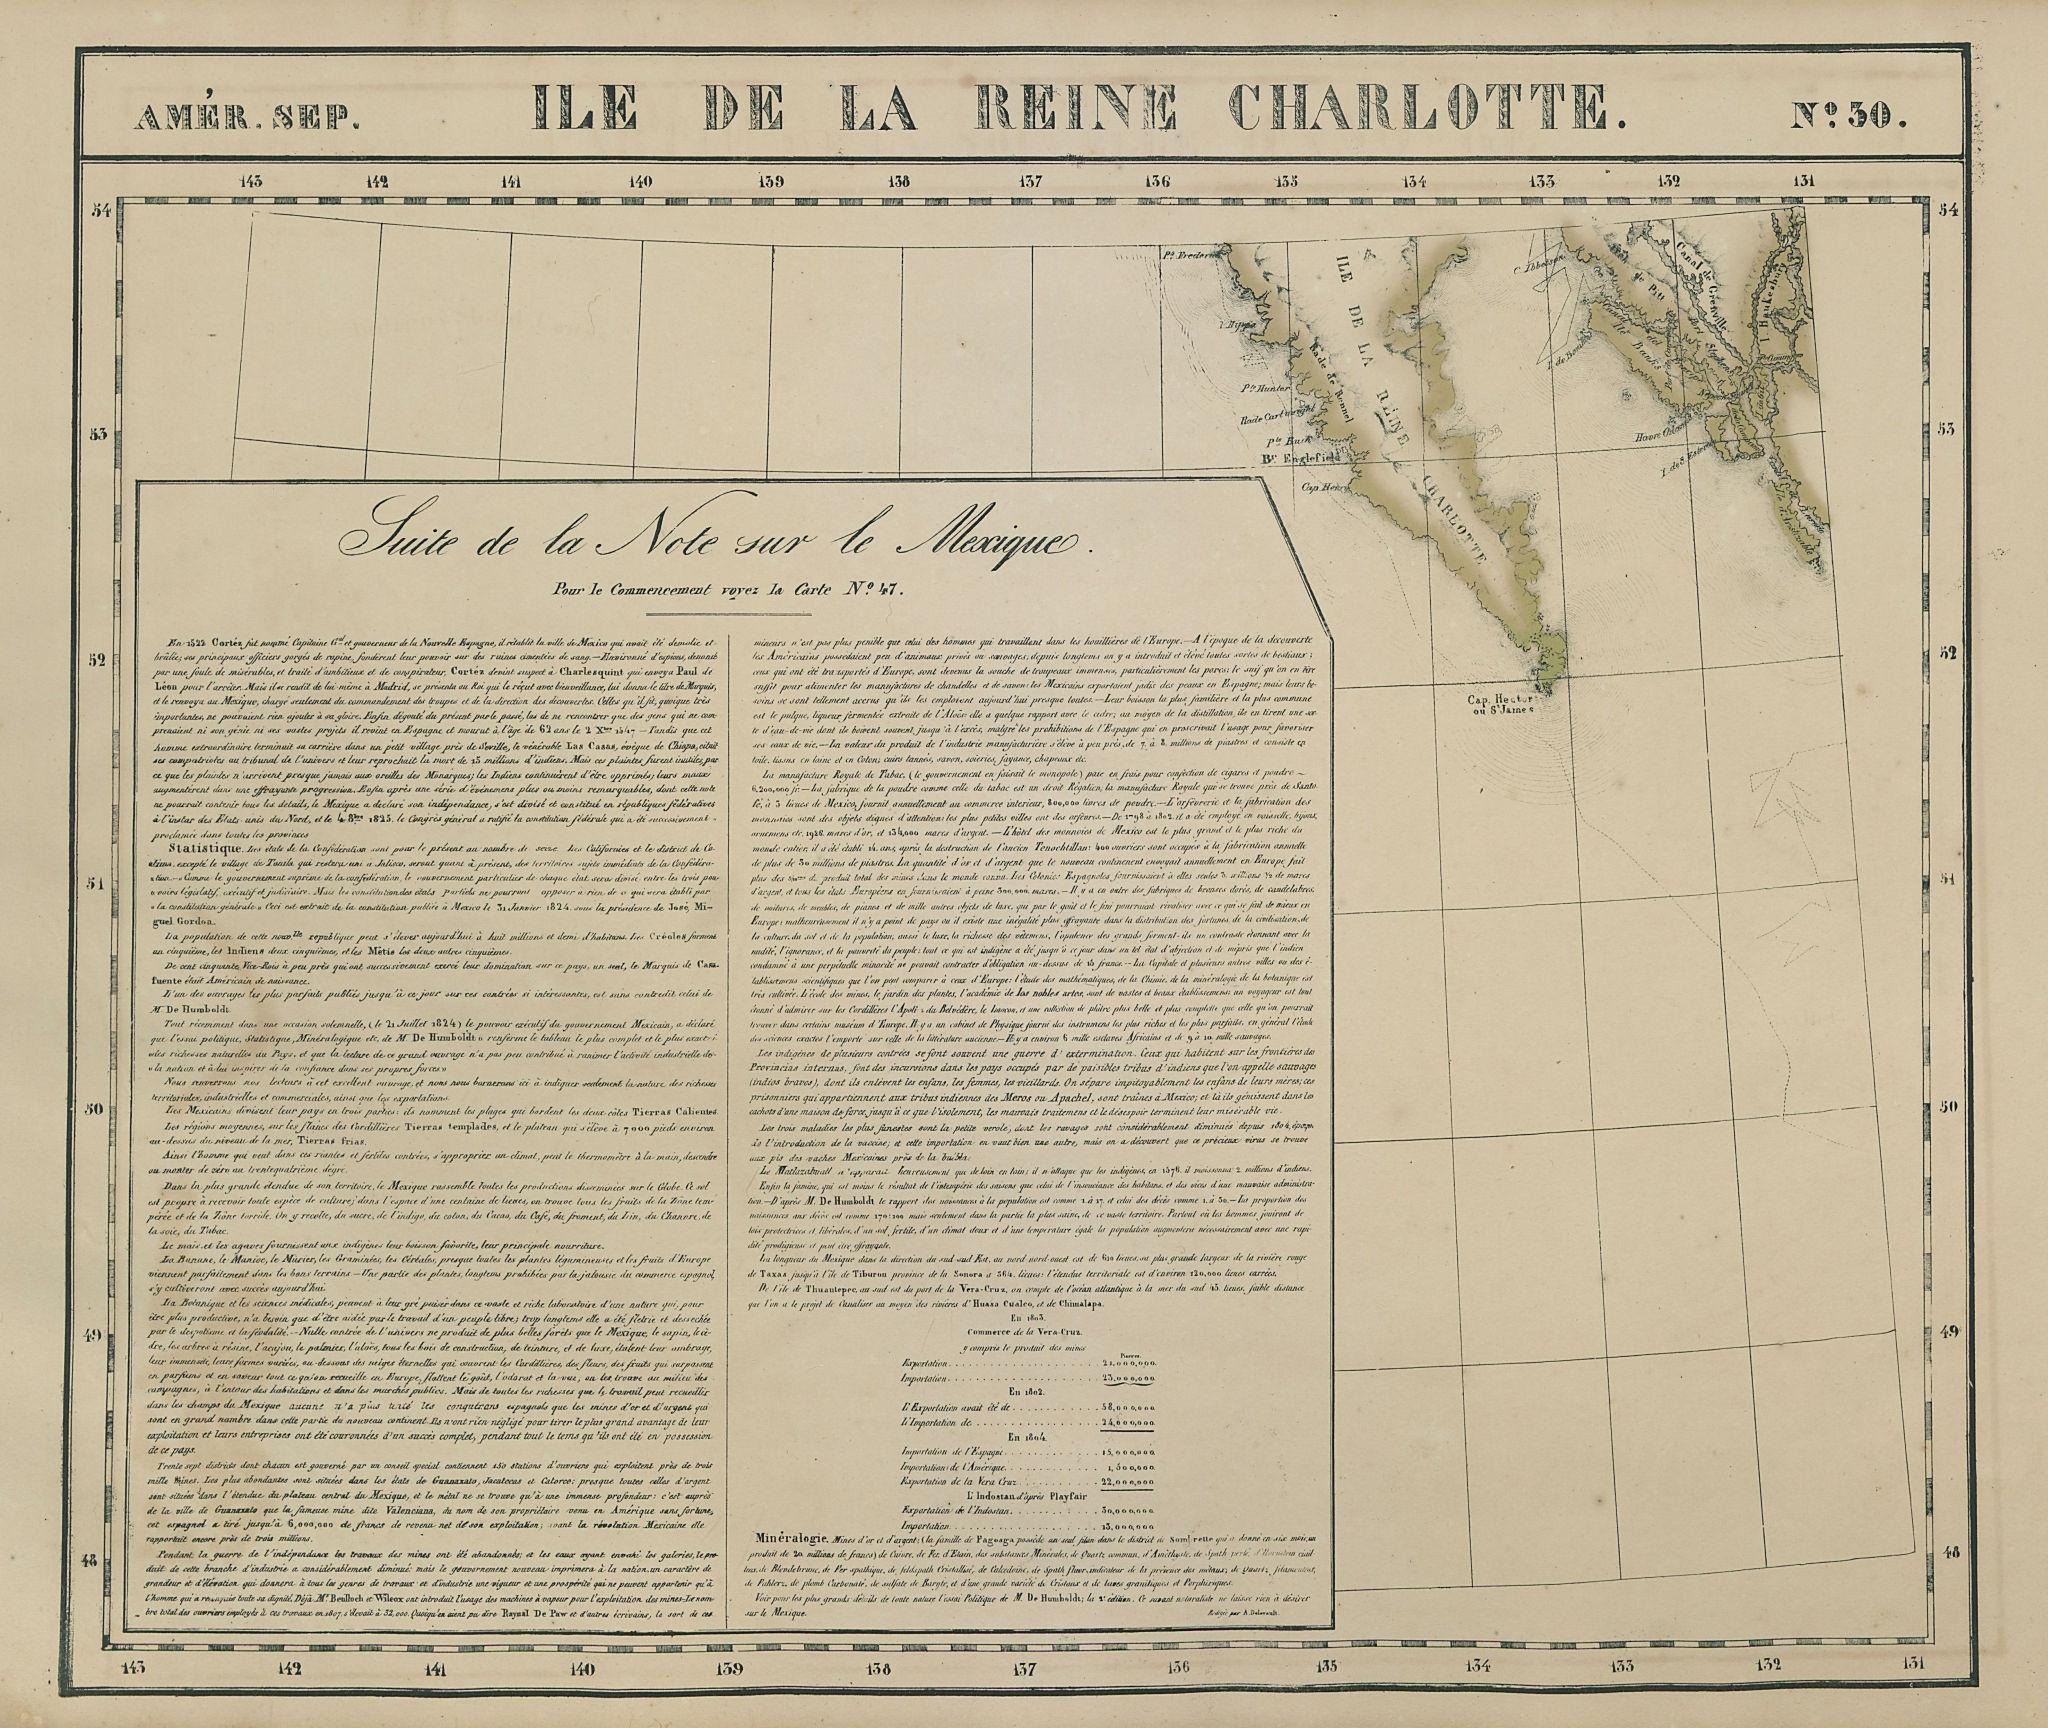 Amér Sep Ile de la Reine Charlotte #30 Haida Gwaii Canada. VANDERMAELEN 1827 map